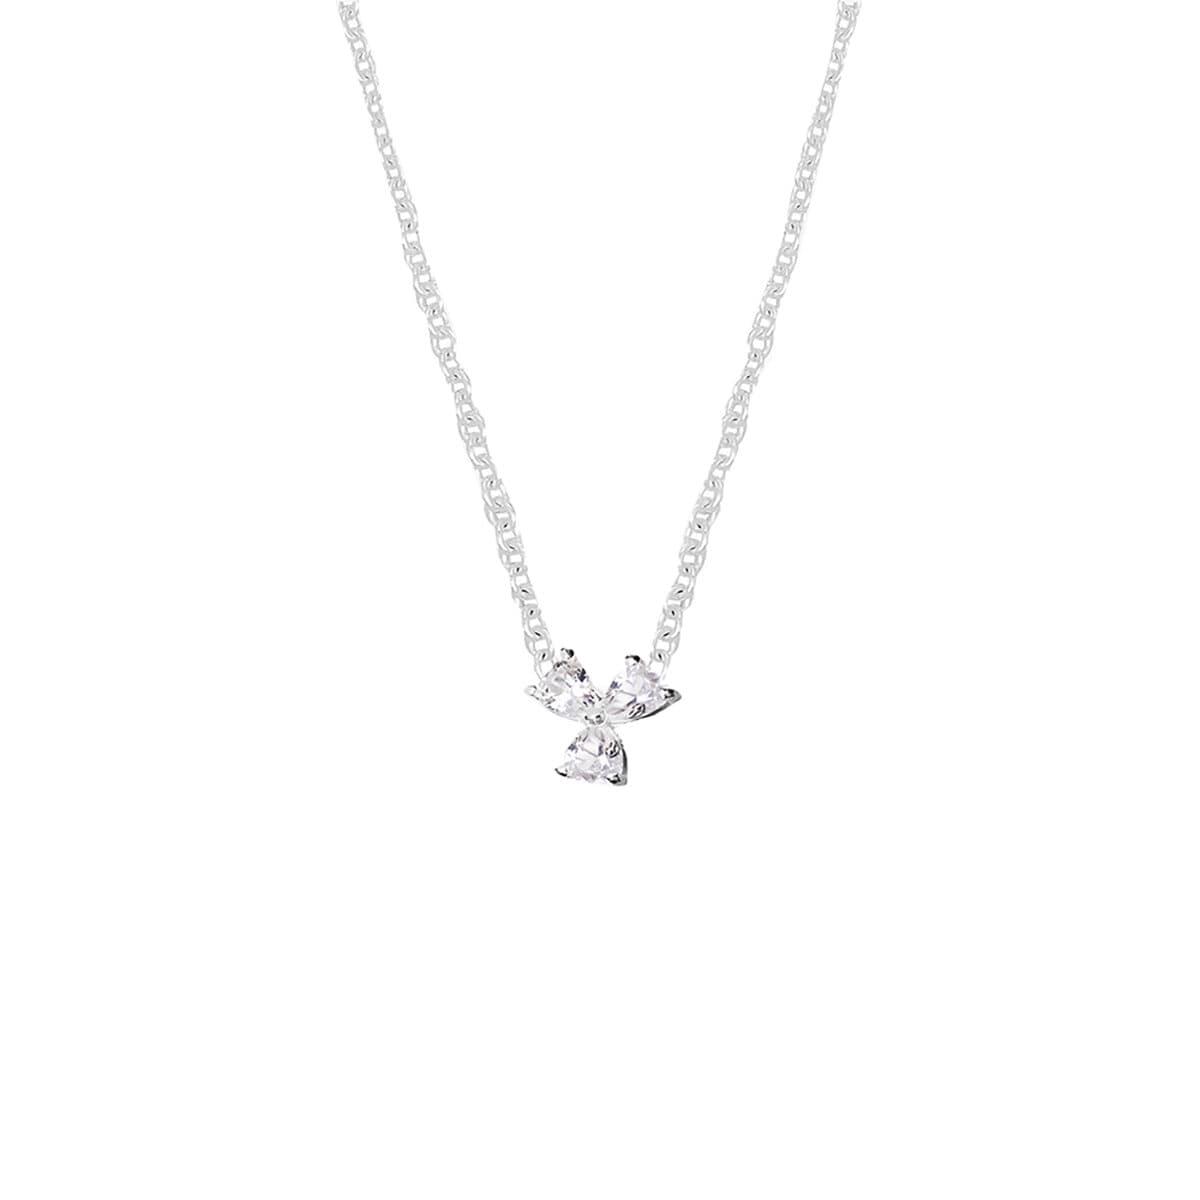 Petite Star Necklace